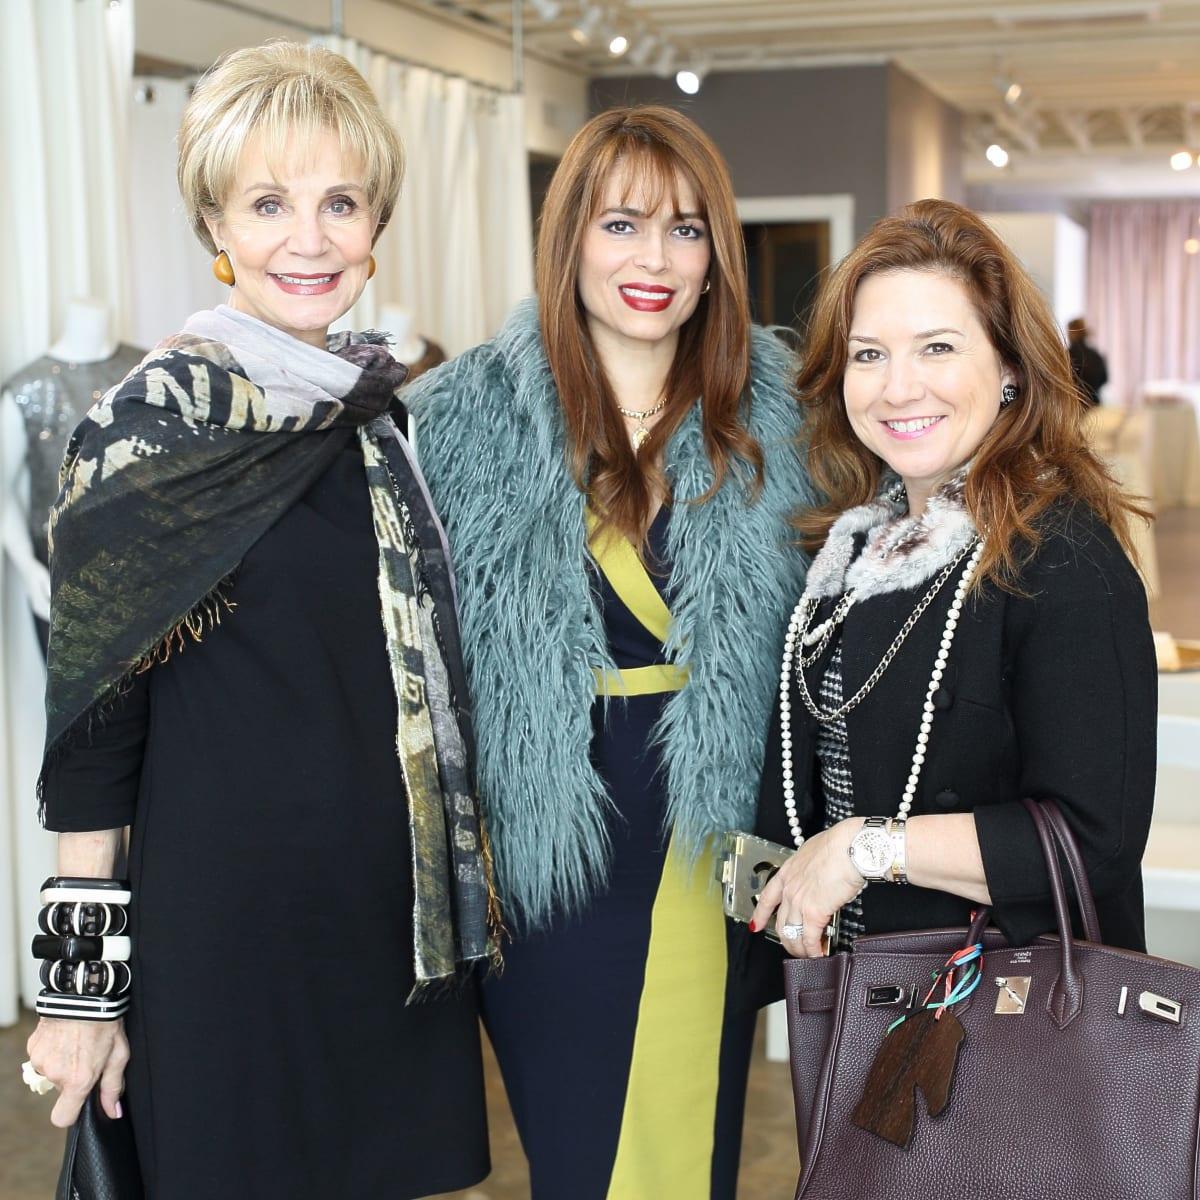 Leisa Holland Nelson, Karina Barberi, Donae Chramosta at Miles David fashion show